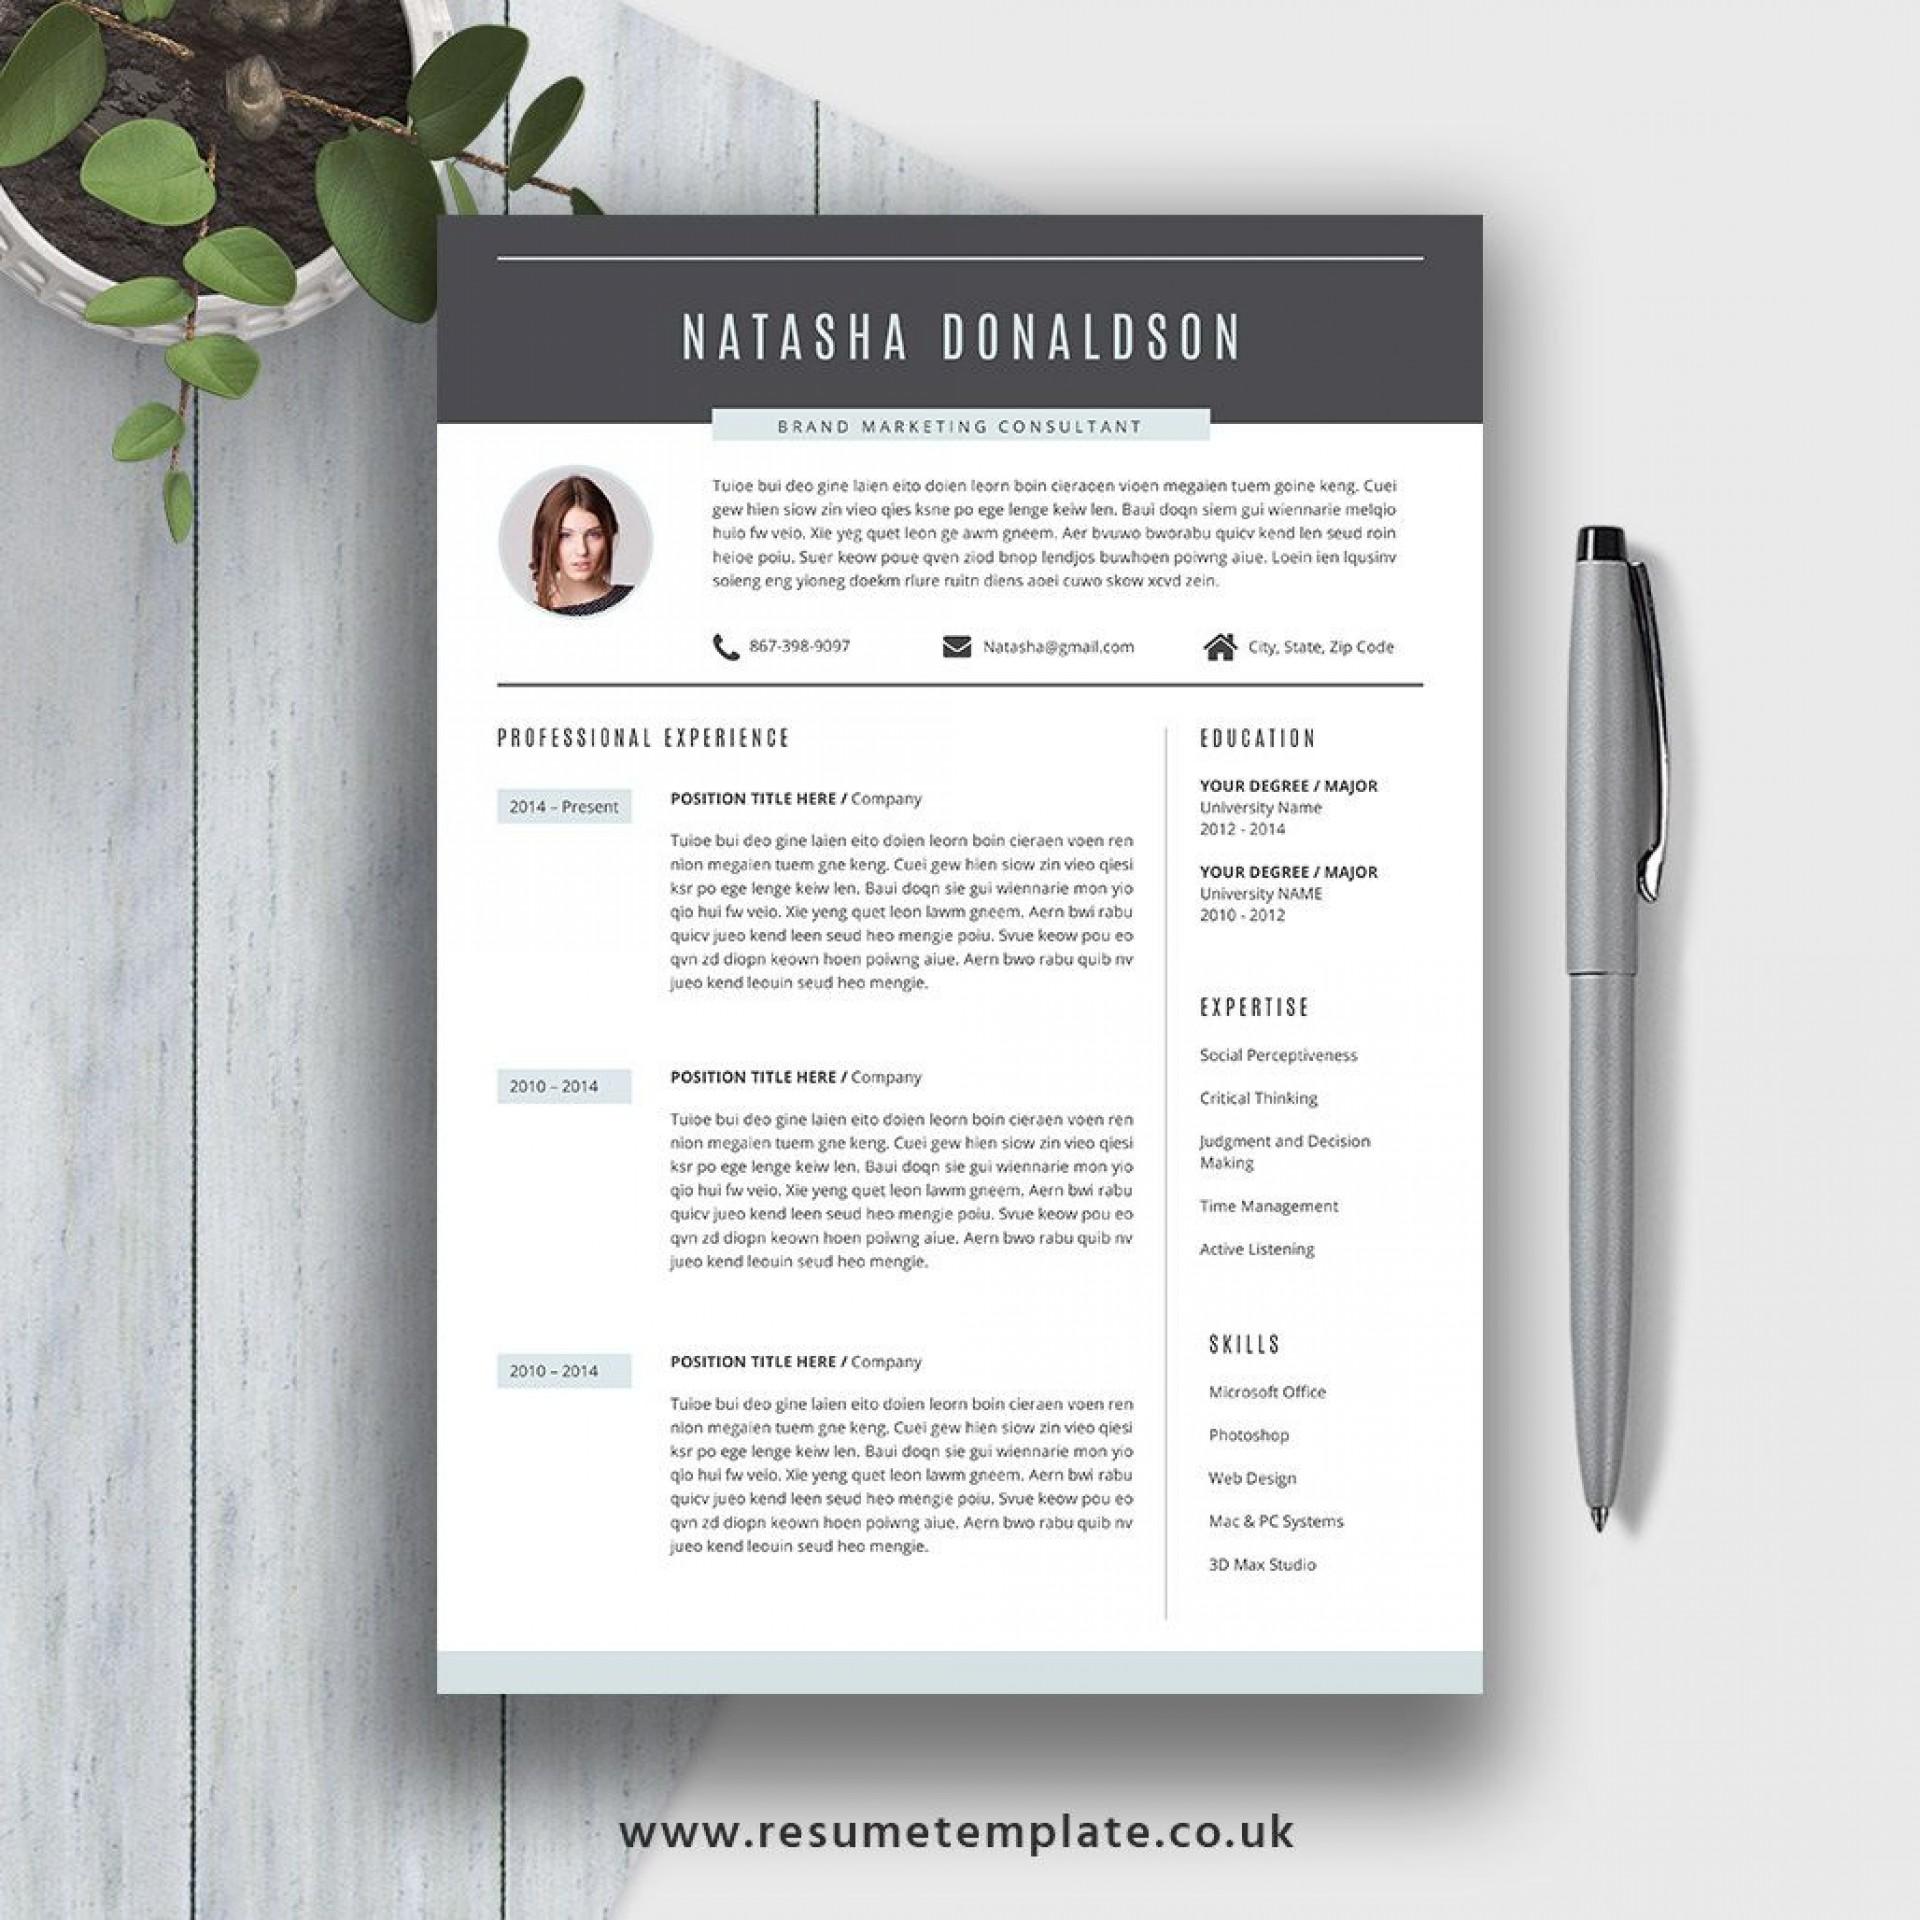 009 Simple Best Resume Template 2020 Design  Top Rated Free Download Reddit1920